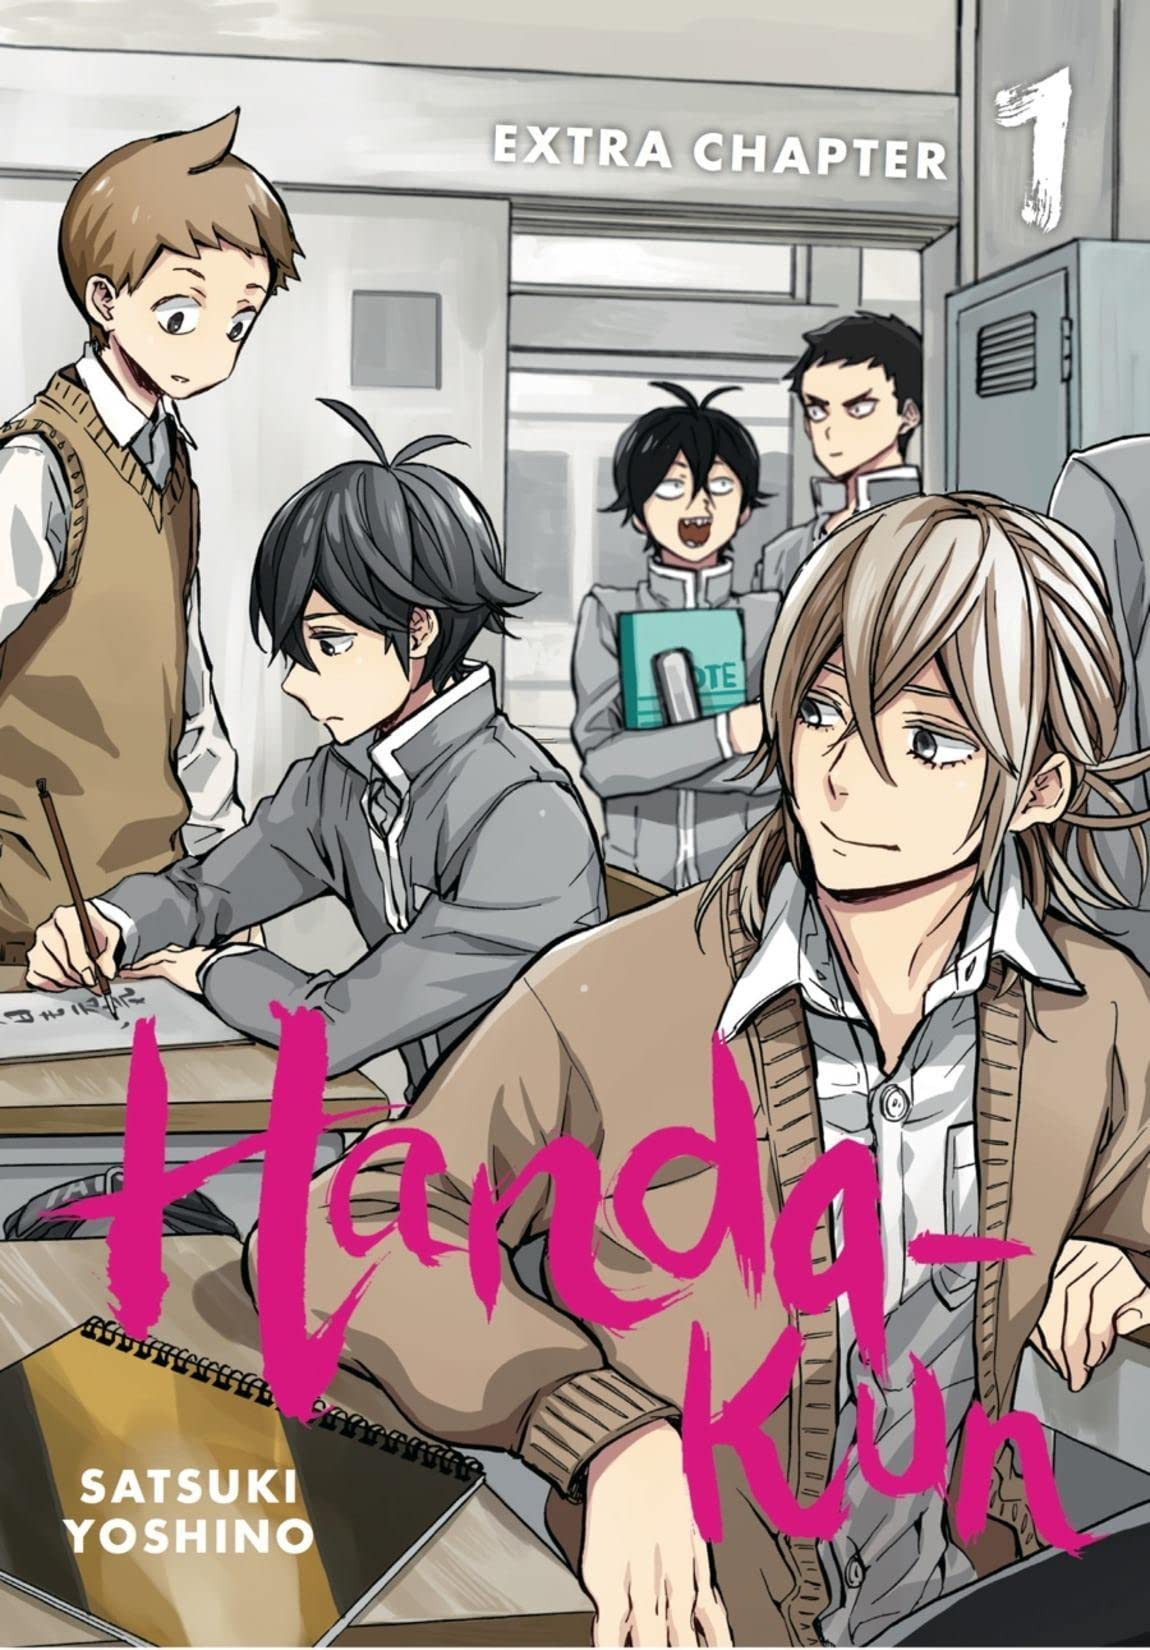 Handa-kun #1: Extra